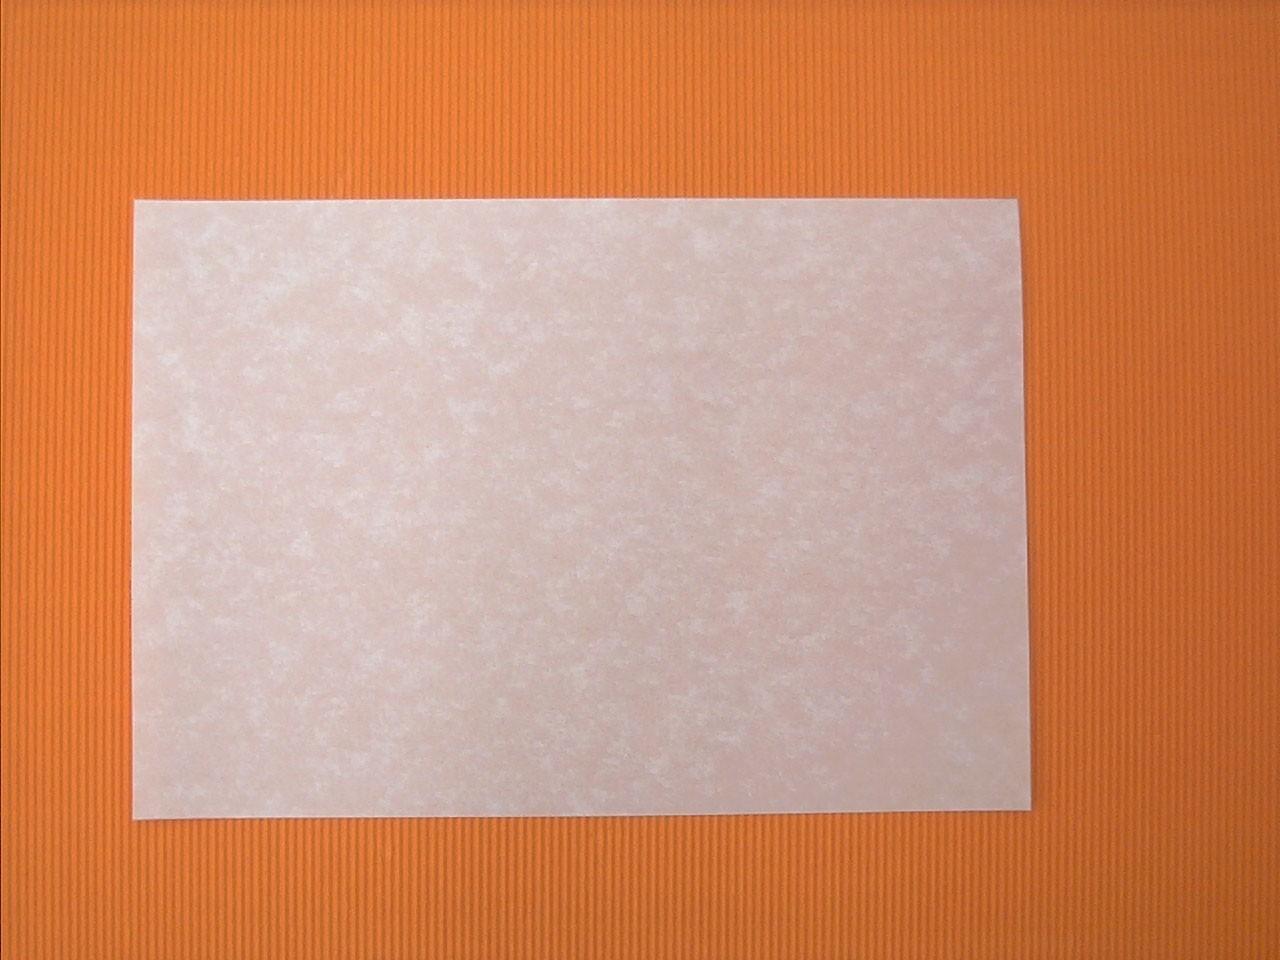 Nomex Gewebefolie, 0,08 mm, Zuschnitt 200 x 300 mm